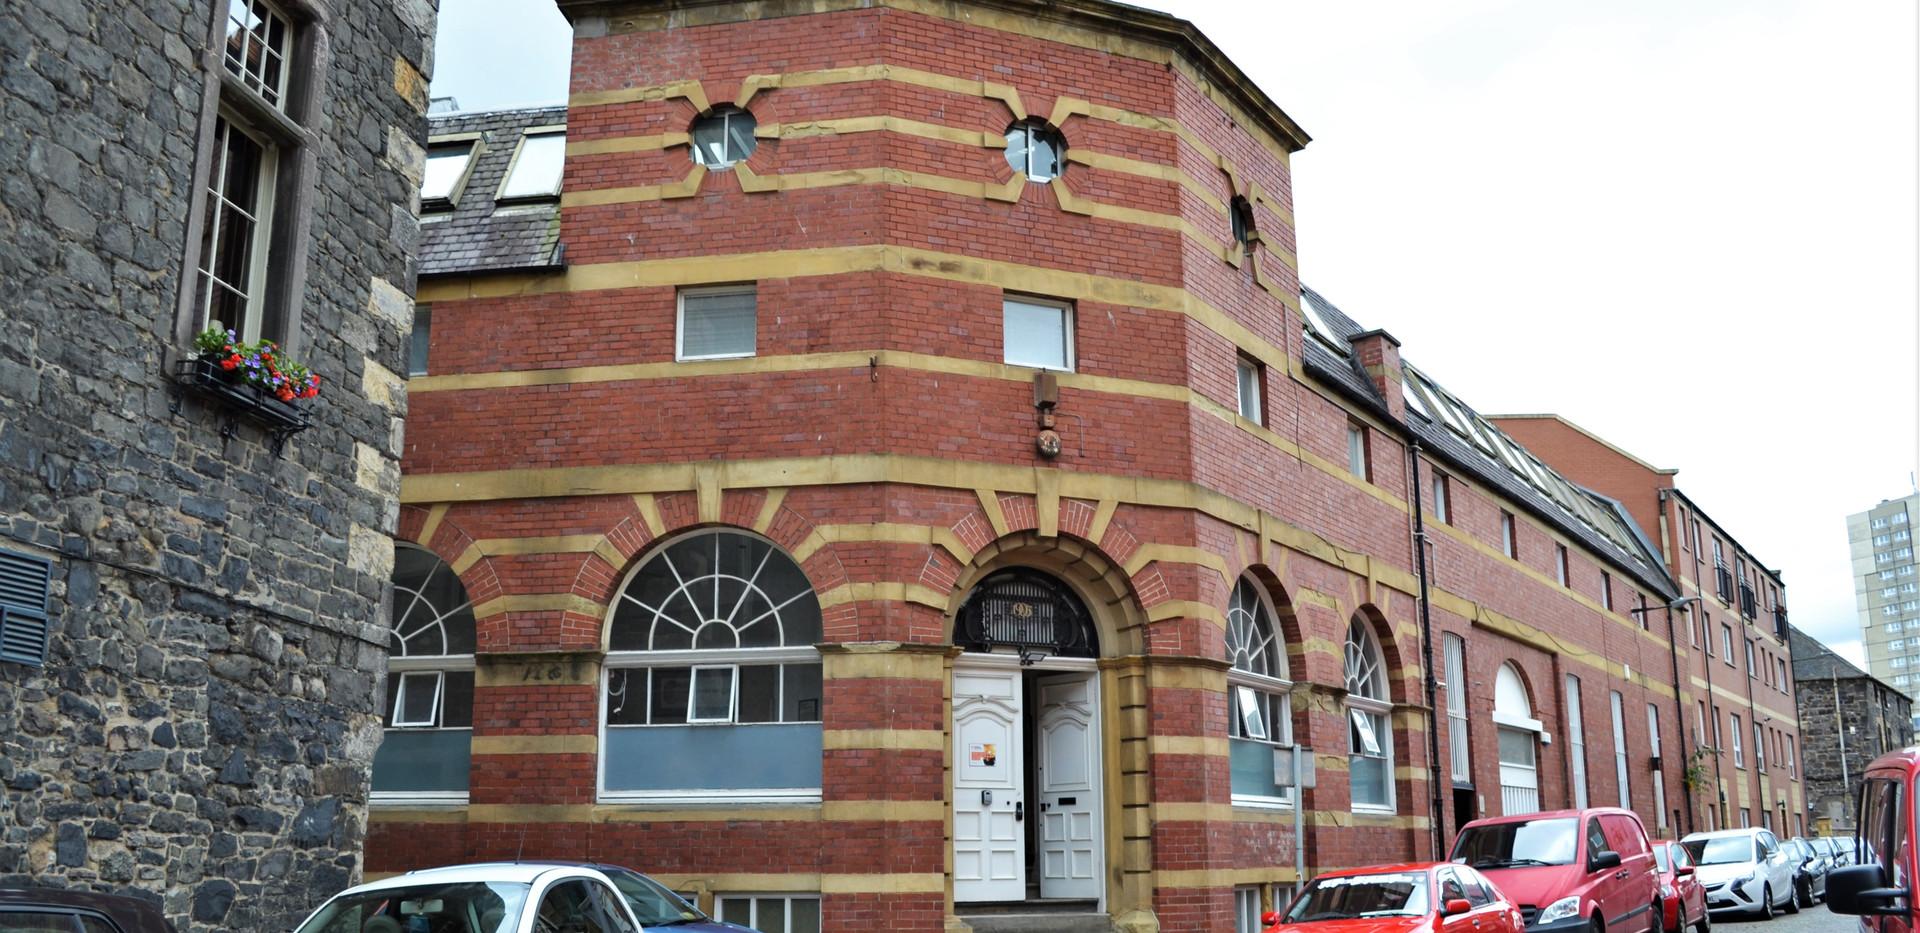 Avonpeak Offices in Leith Edinburgh